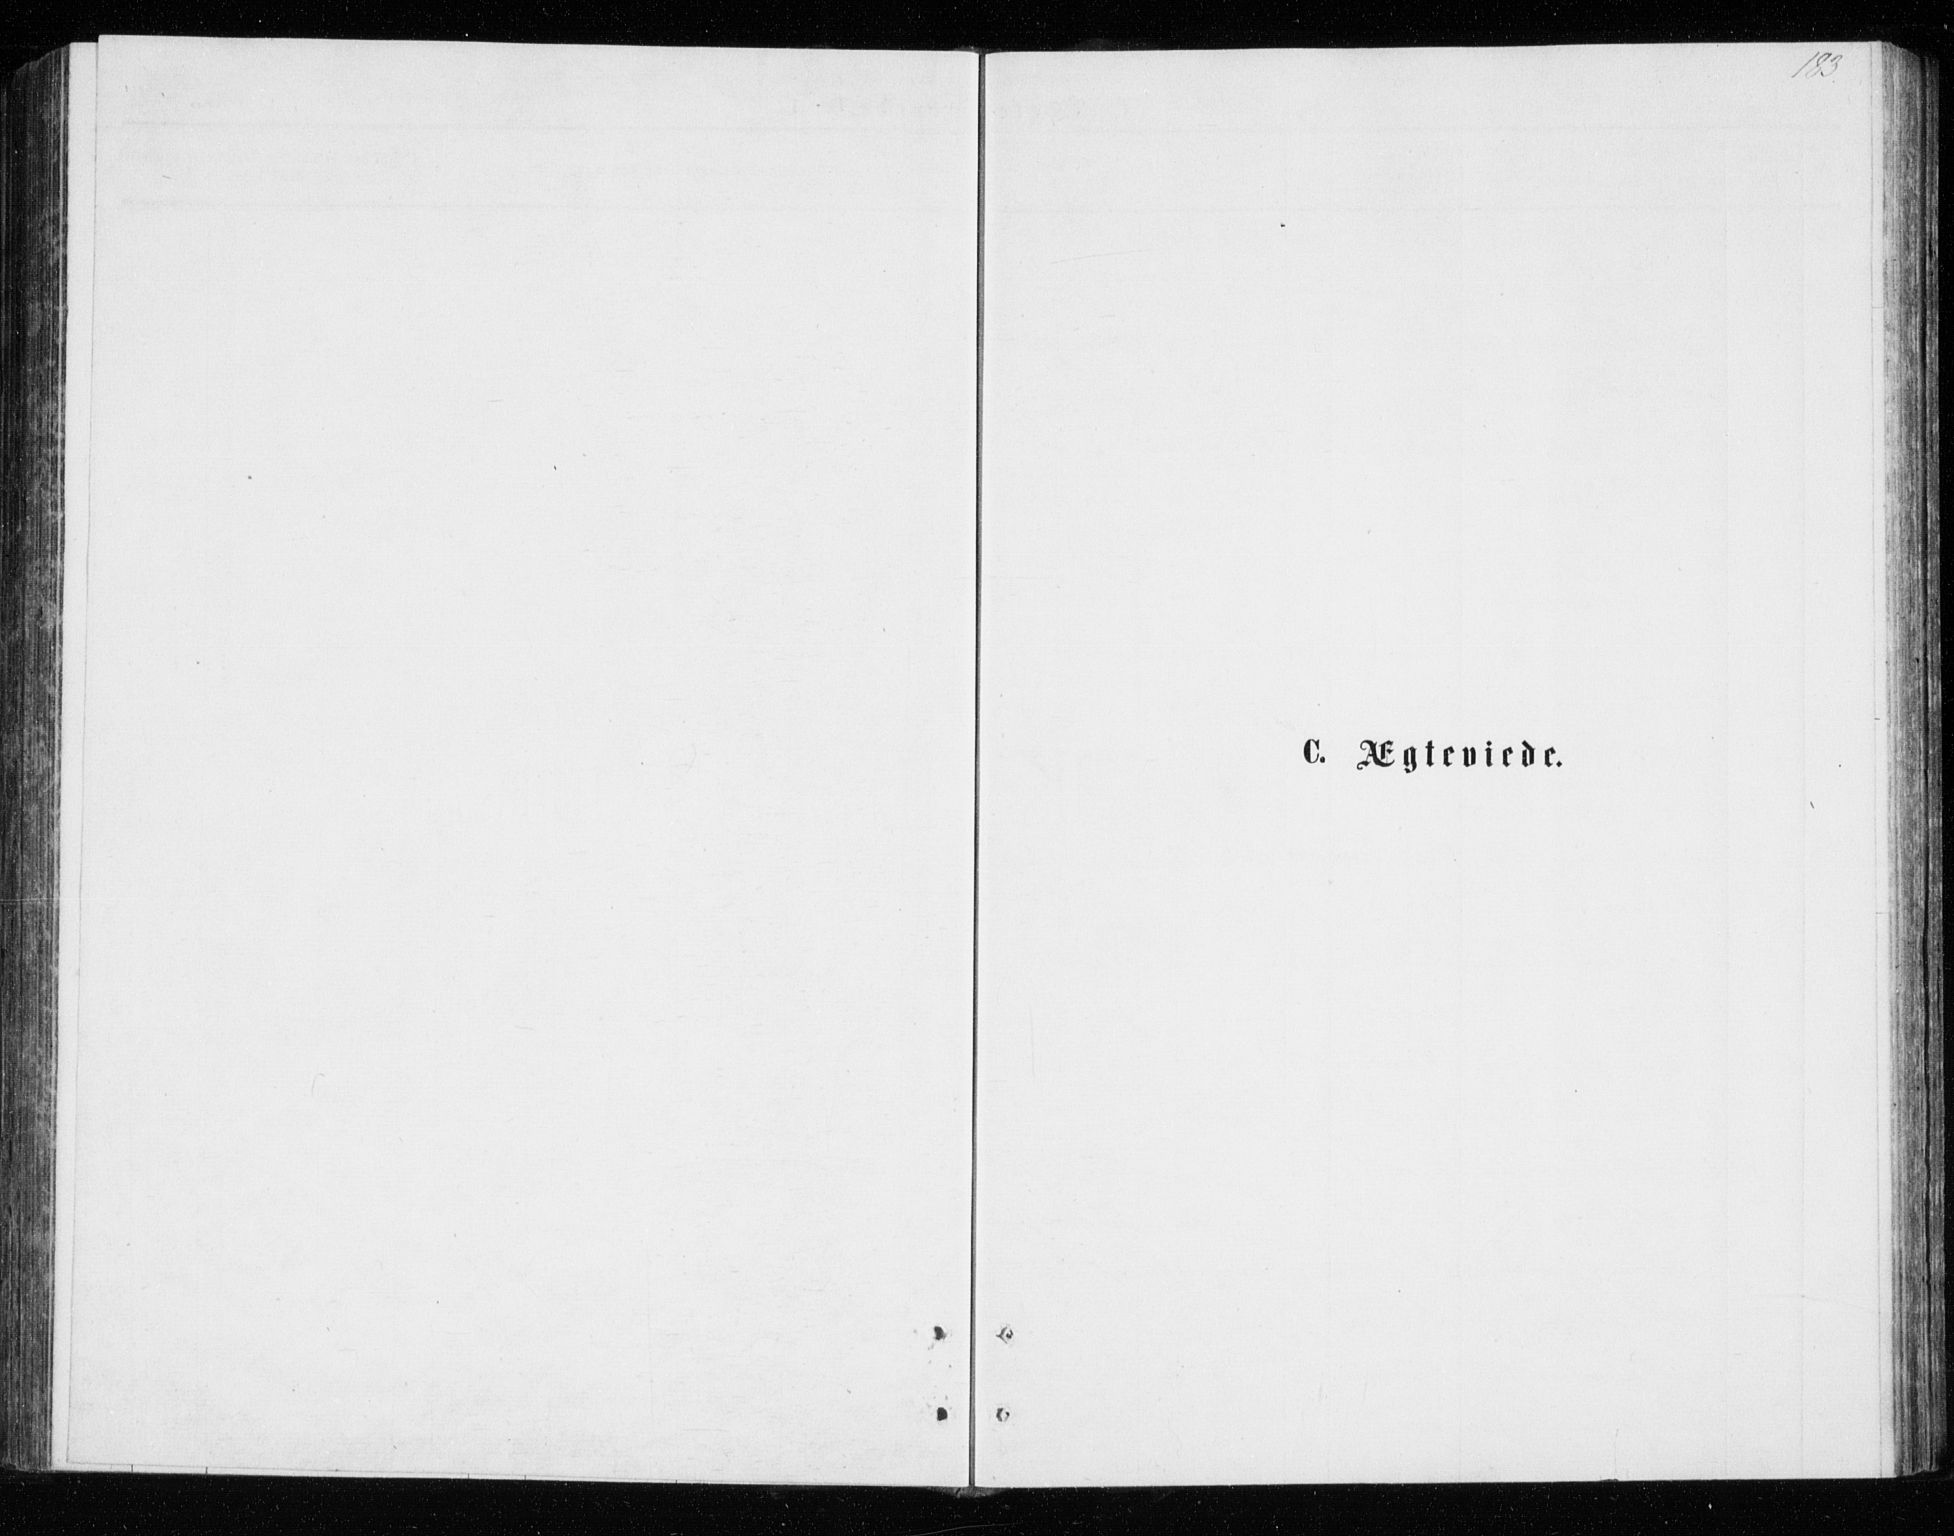 SATØ, Tromsø sokneprestkontor/stiftsprosti/domprosti, G/Gb/L0008klokker: Klokkerbok nr. 8, 1875-1879, s. 183